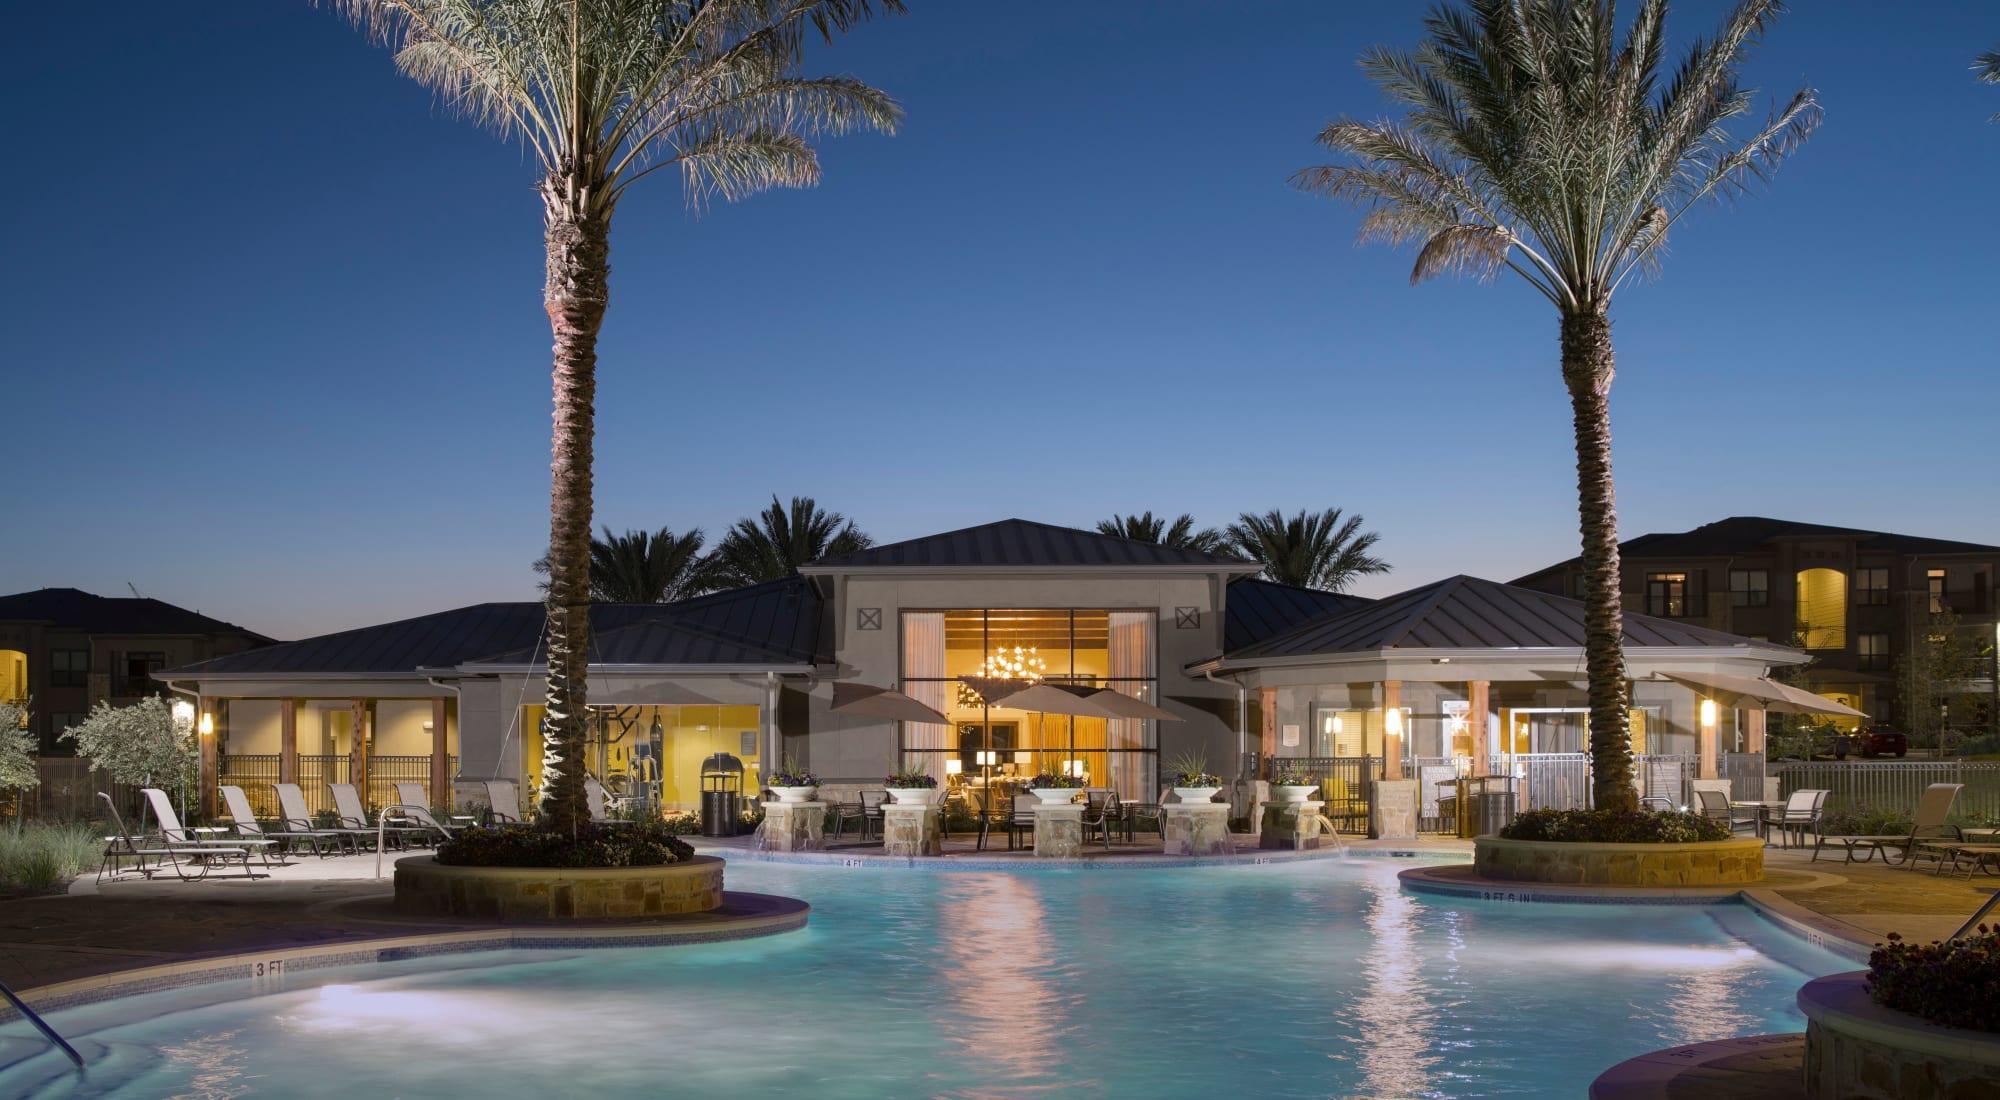 Apartments at Savannah Oaks in San Antonio, Texas